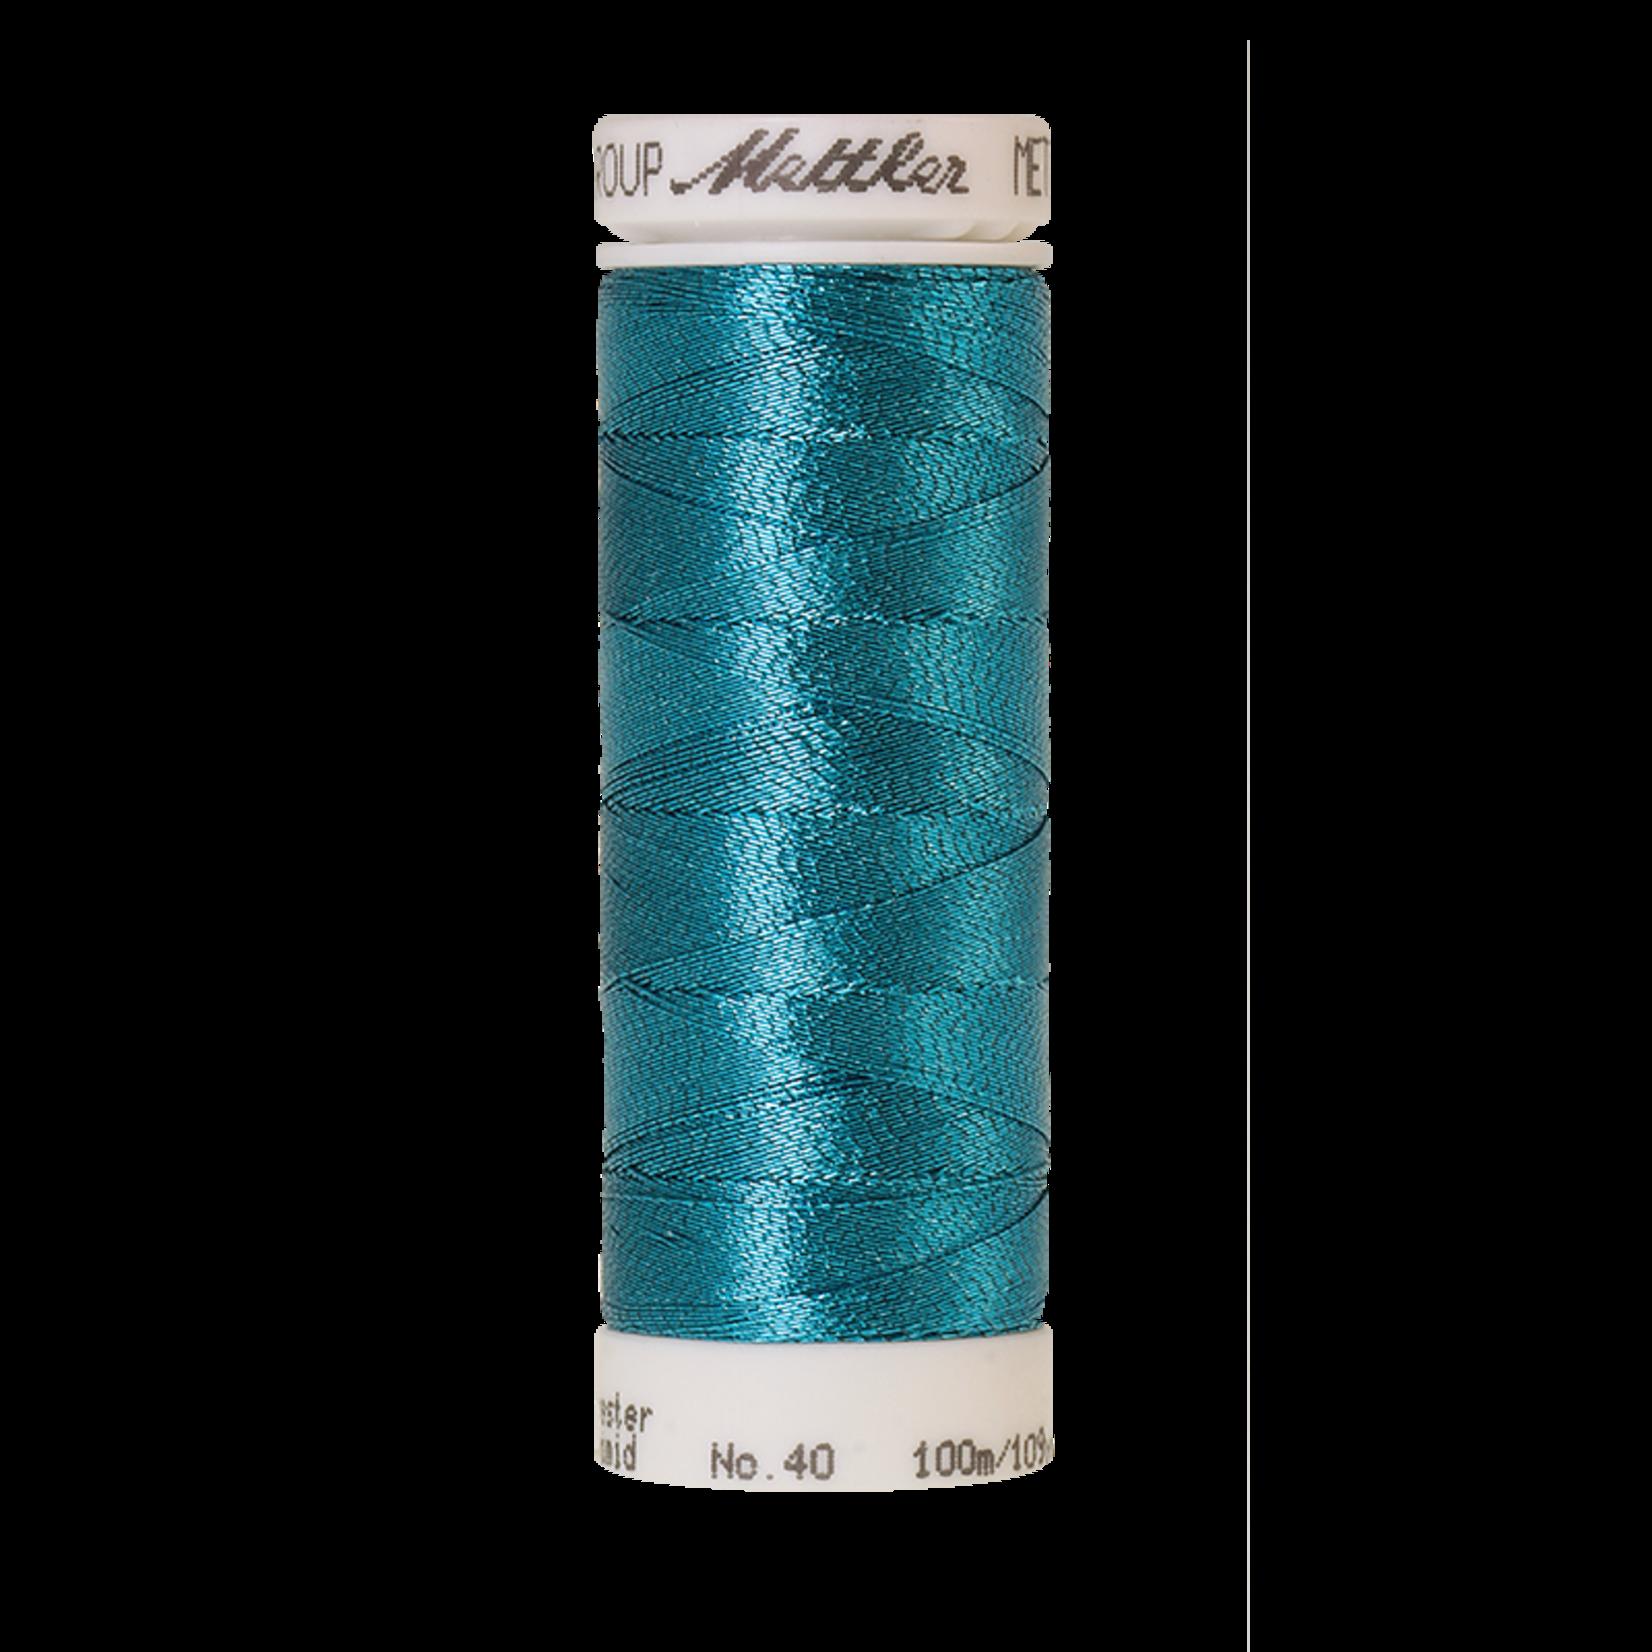 Amann Mettler Metallic - #40 - 100 m - 4101 Bright Turquoise